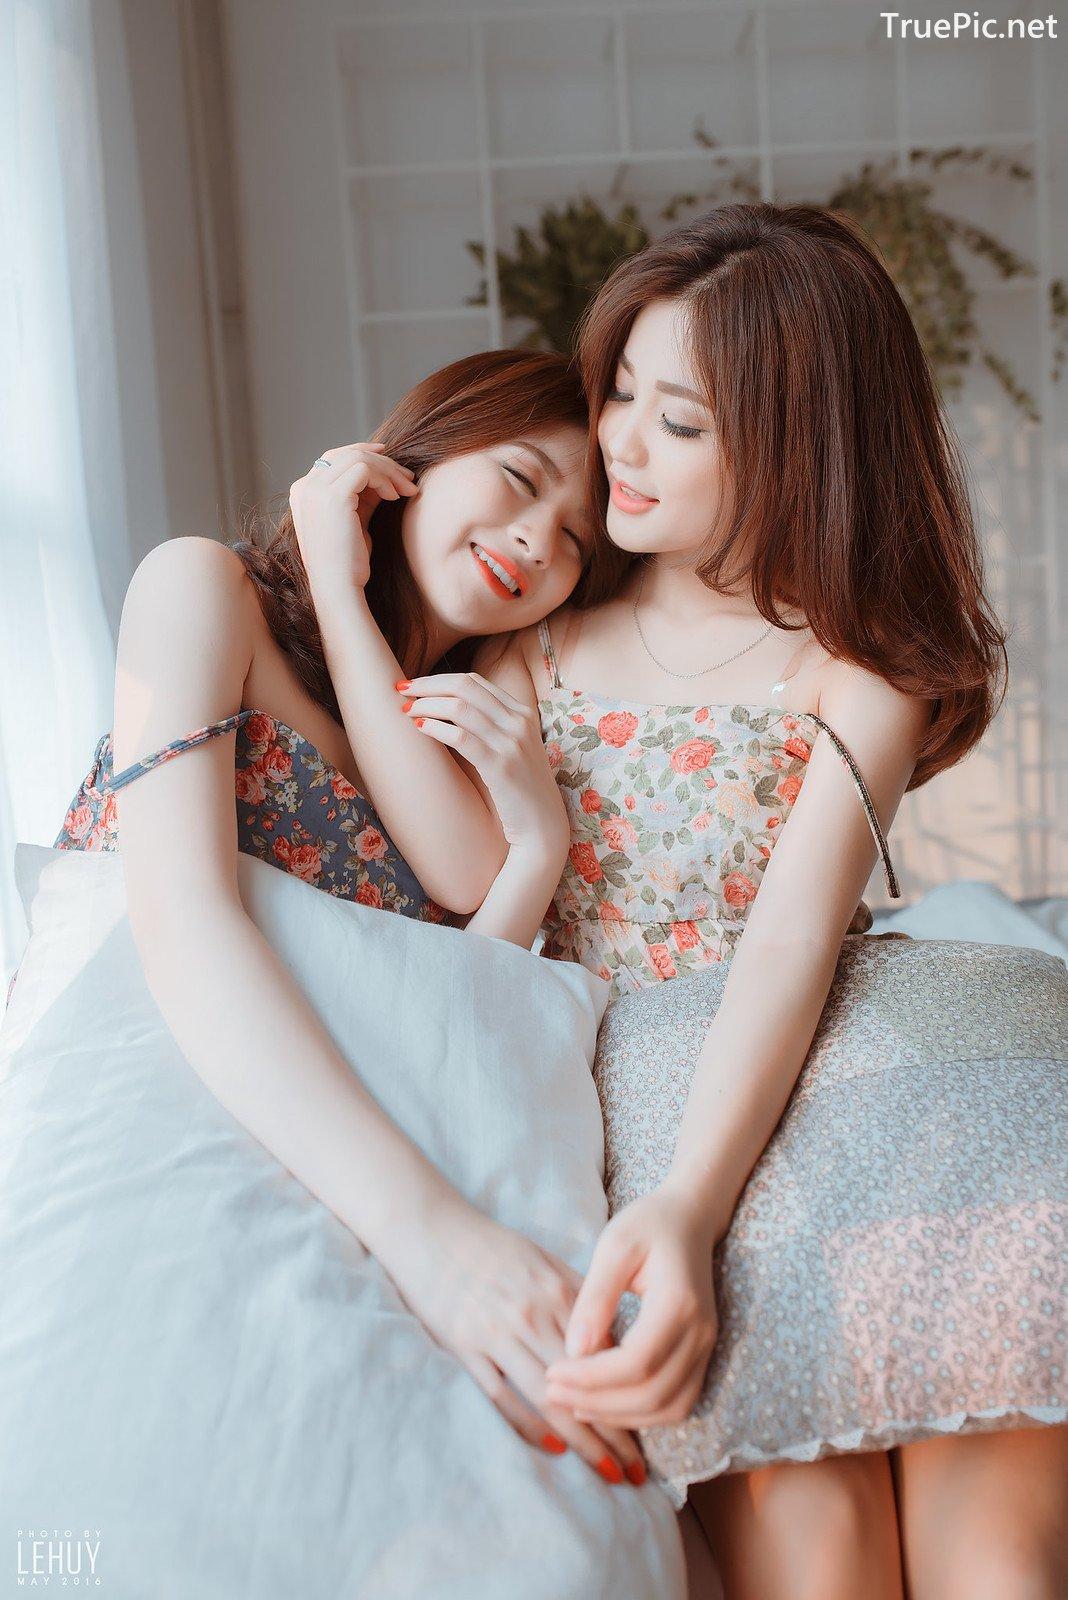 Image-Vietnamese-Hot-Girl-Photo-Beautiful-Twin-Sister-TruePic.net- Picture-4